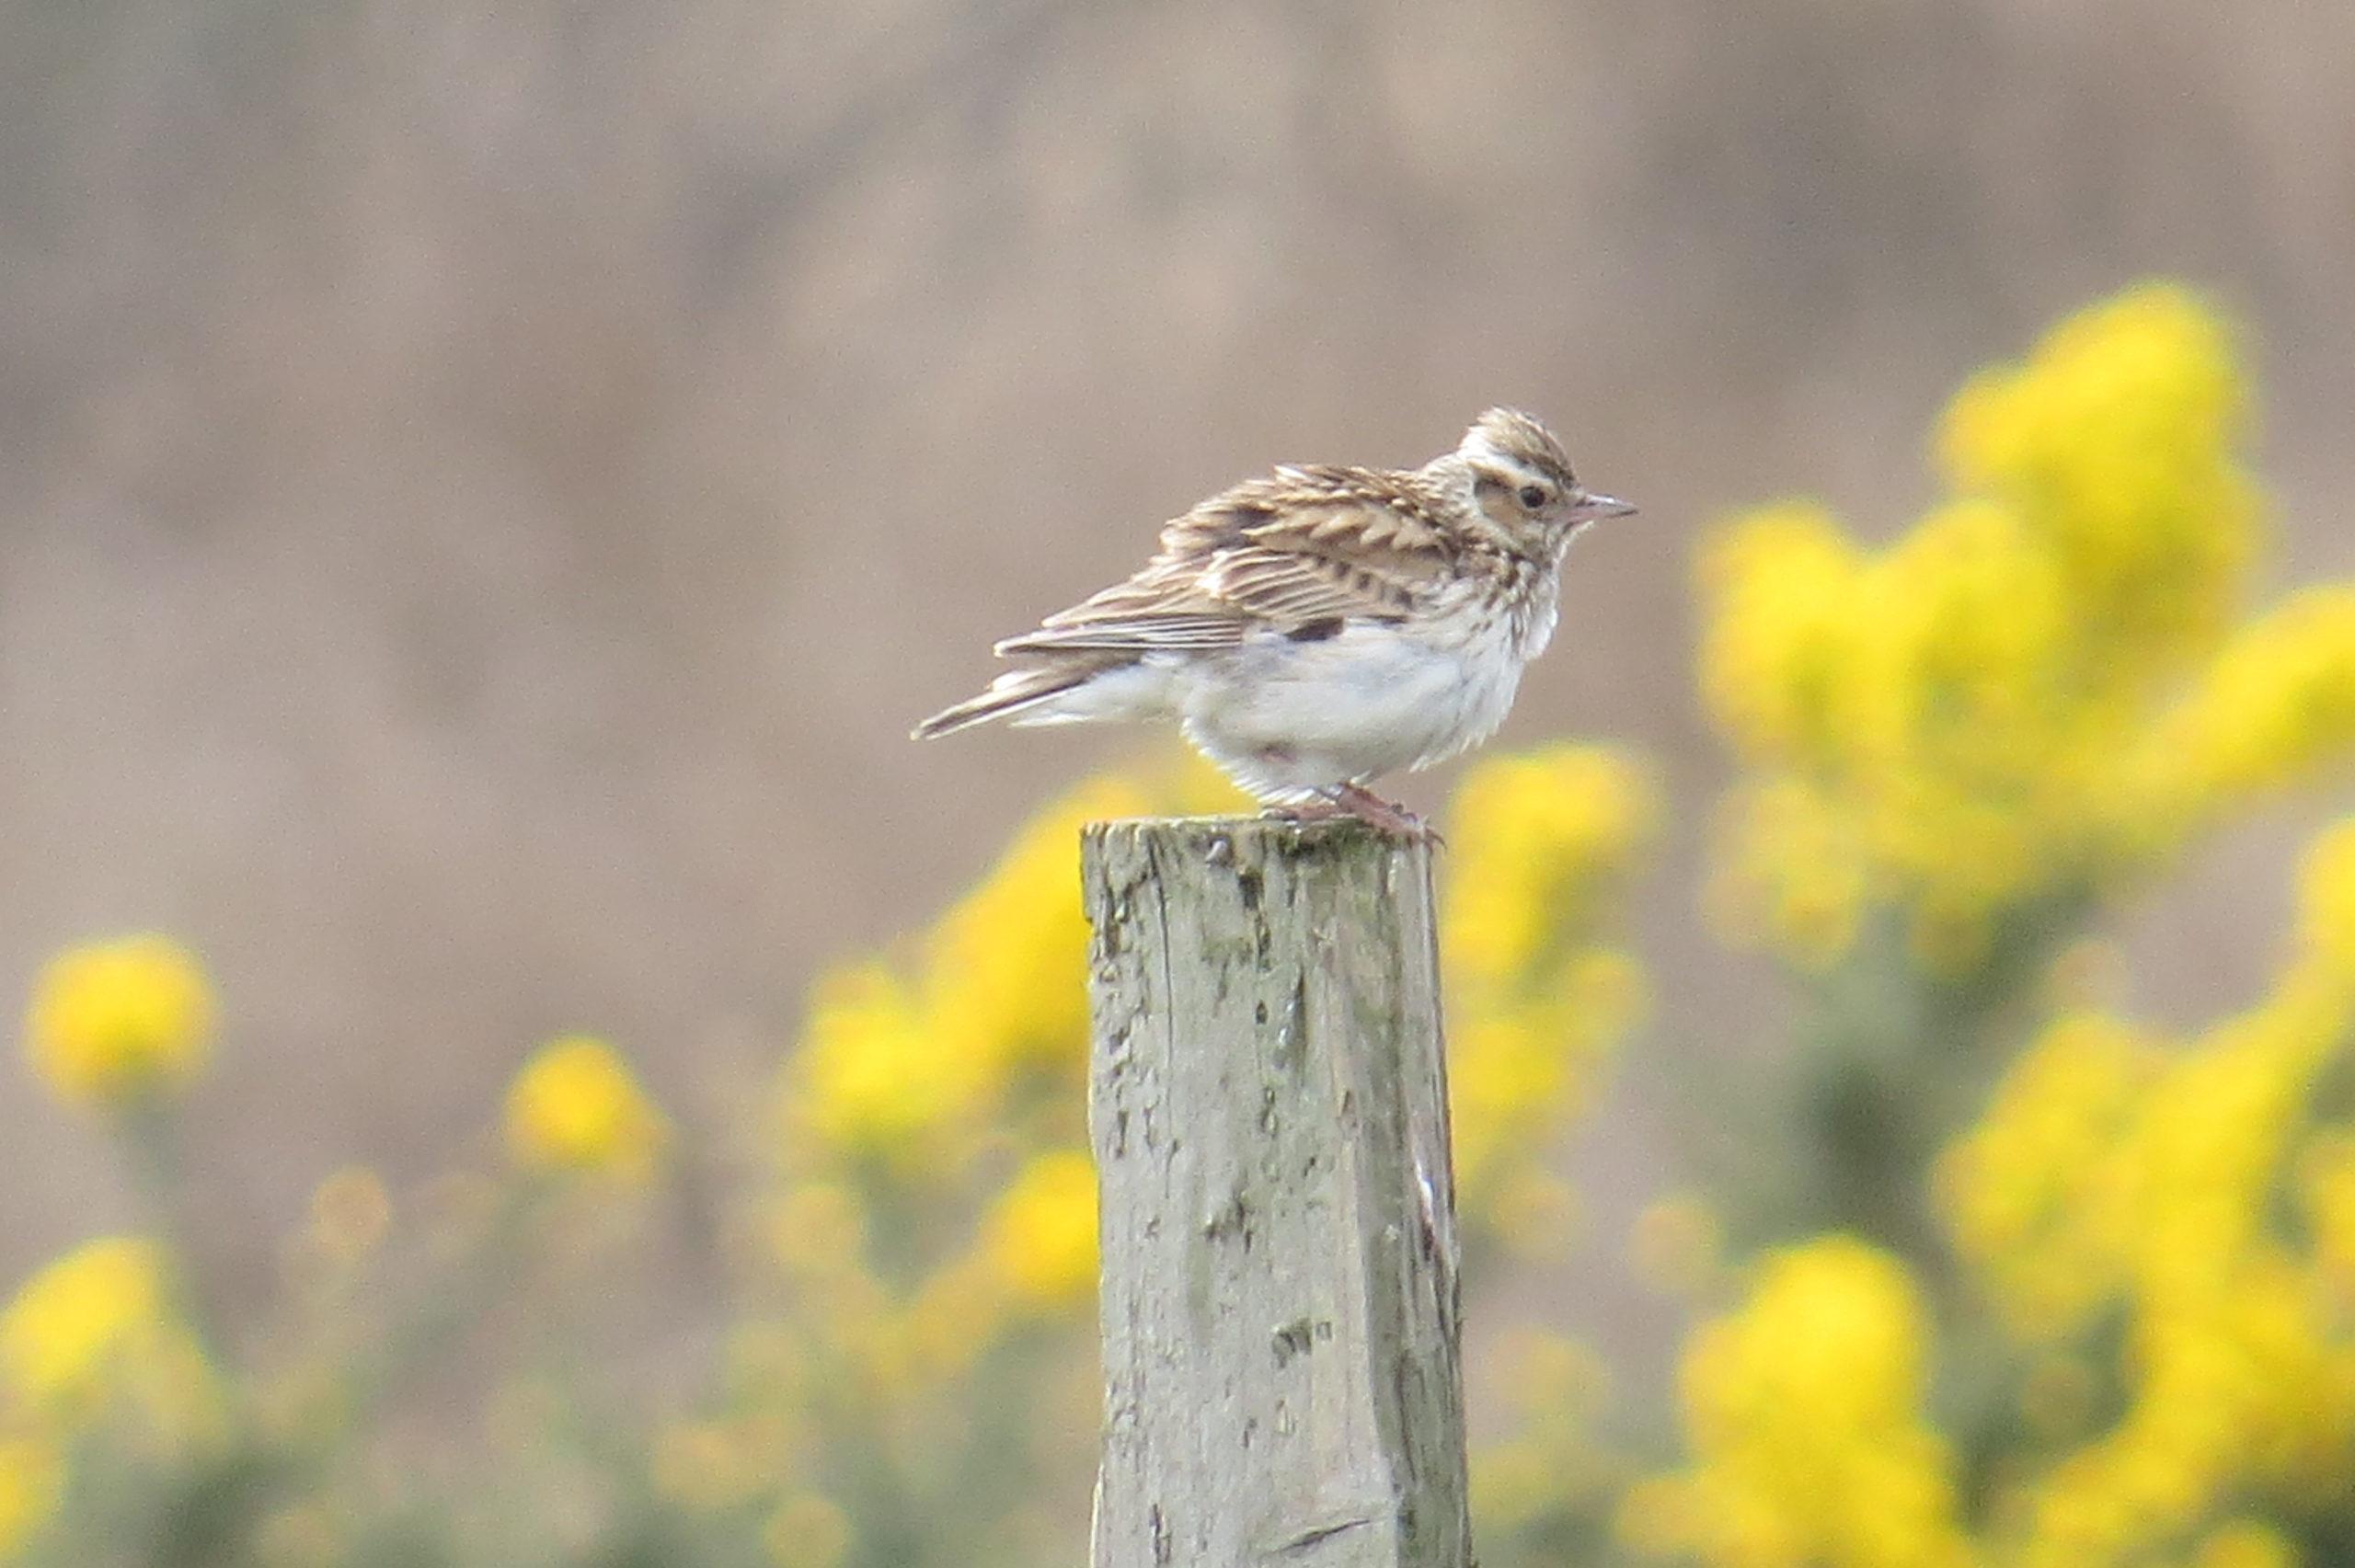 Woodlark photographed on the SPA by Michael Jones